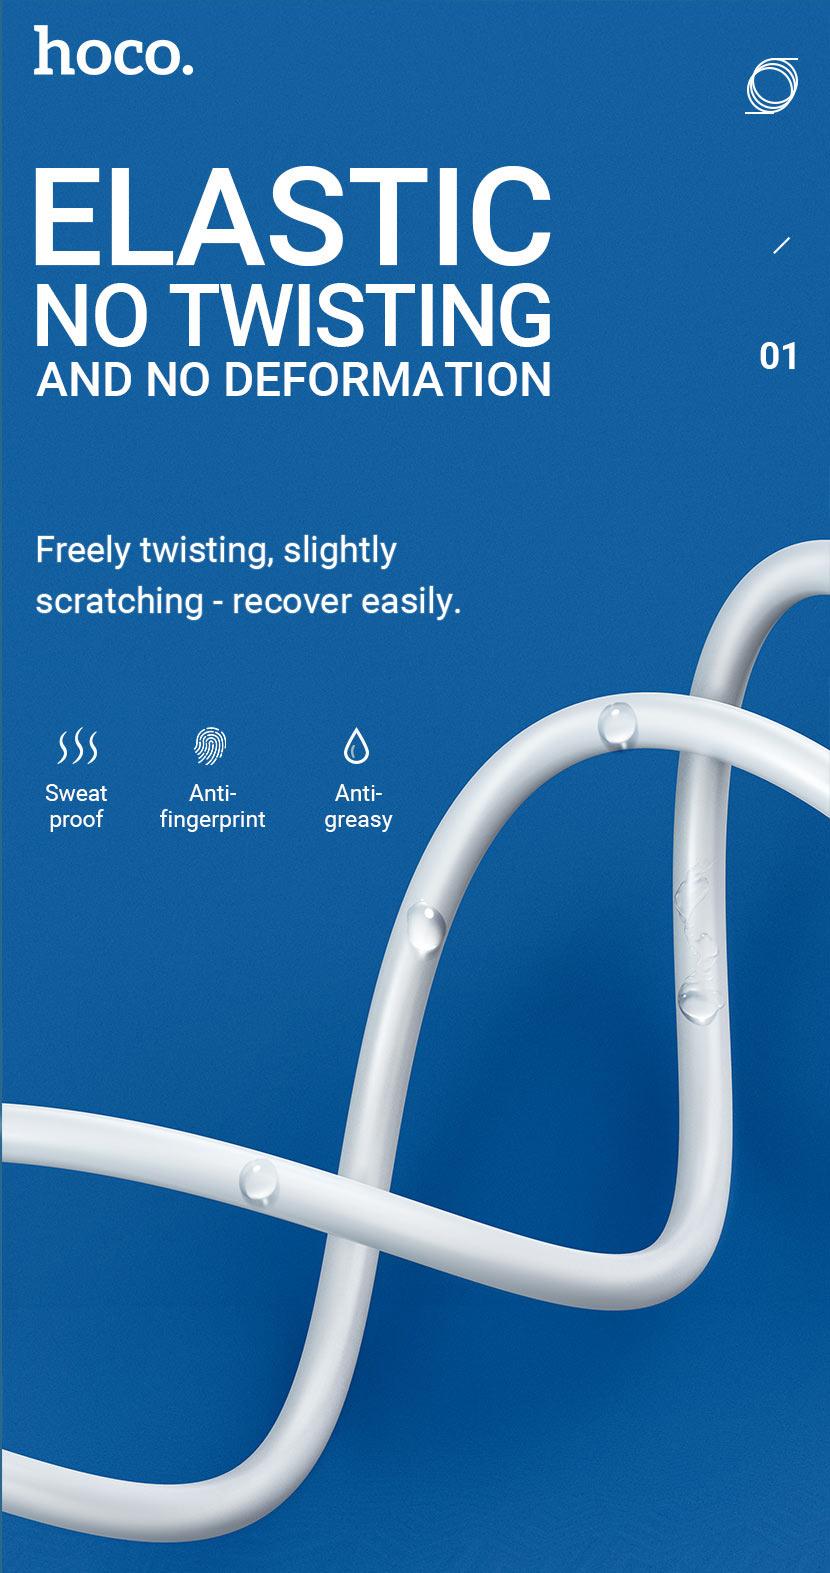 hoco news x49 beloved charging data cable elastic en